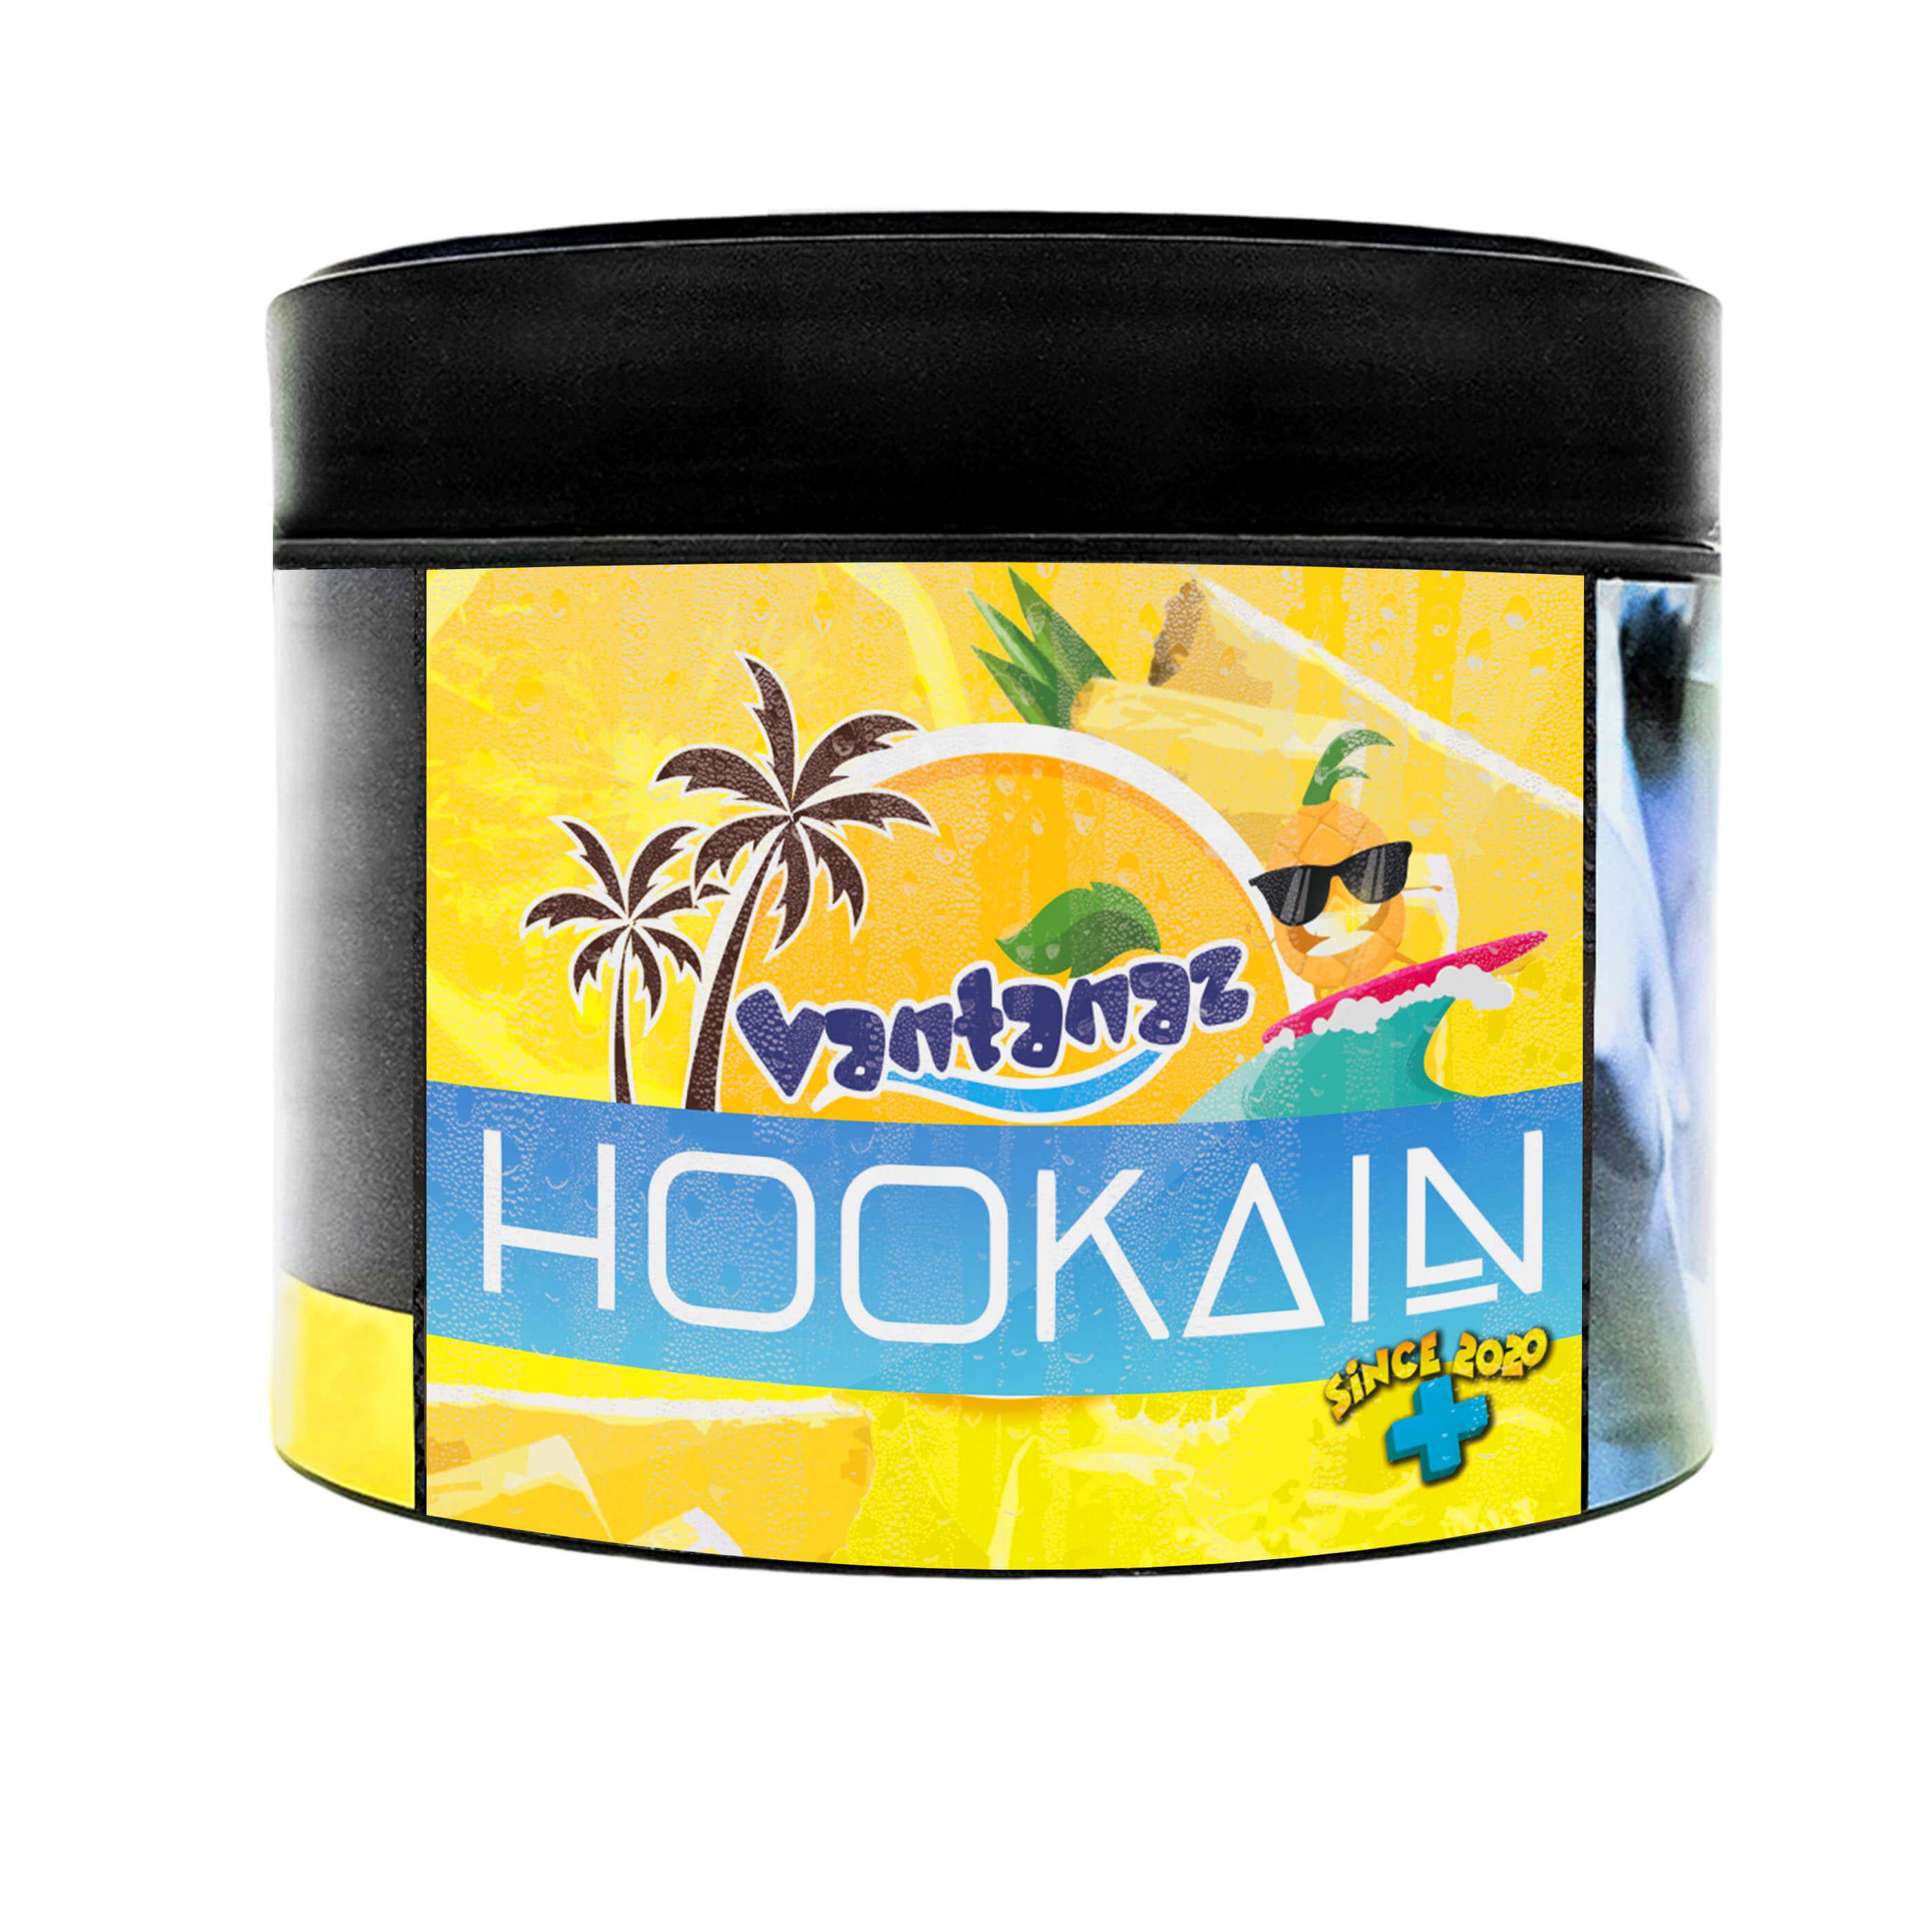 Hookain Tabak Vantanaz 200g